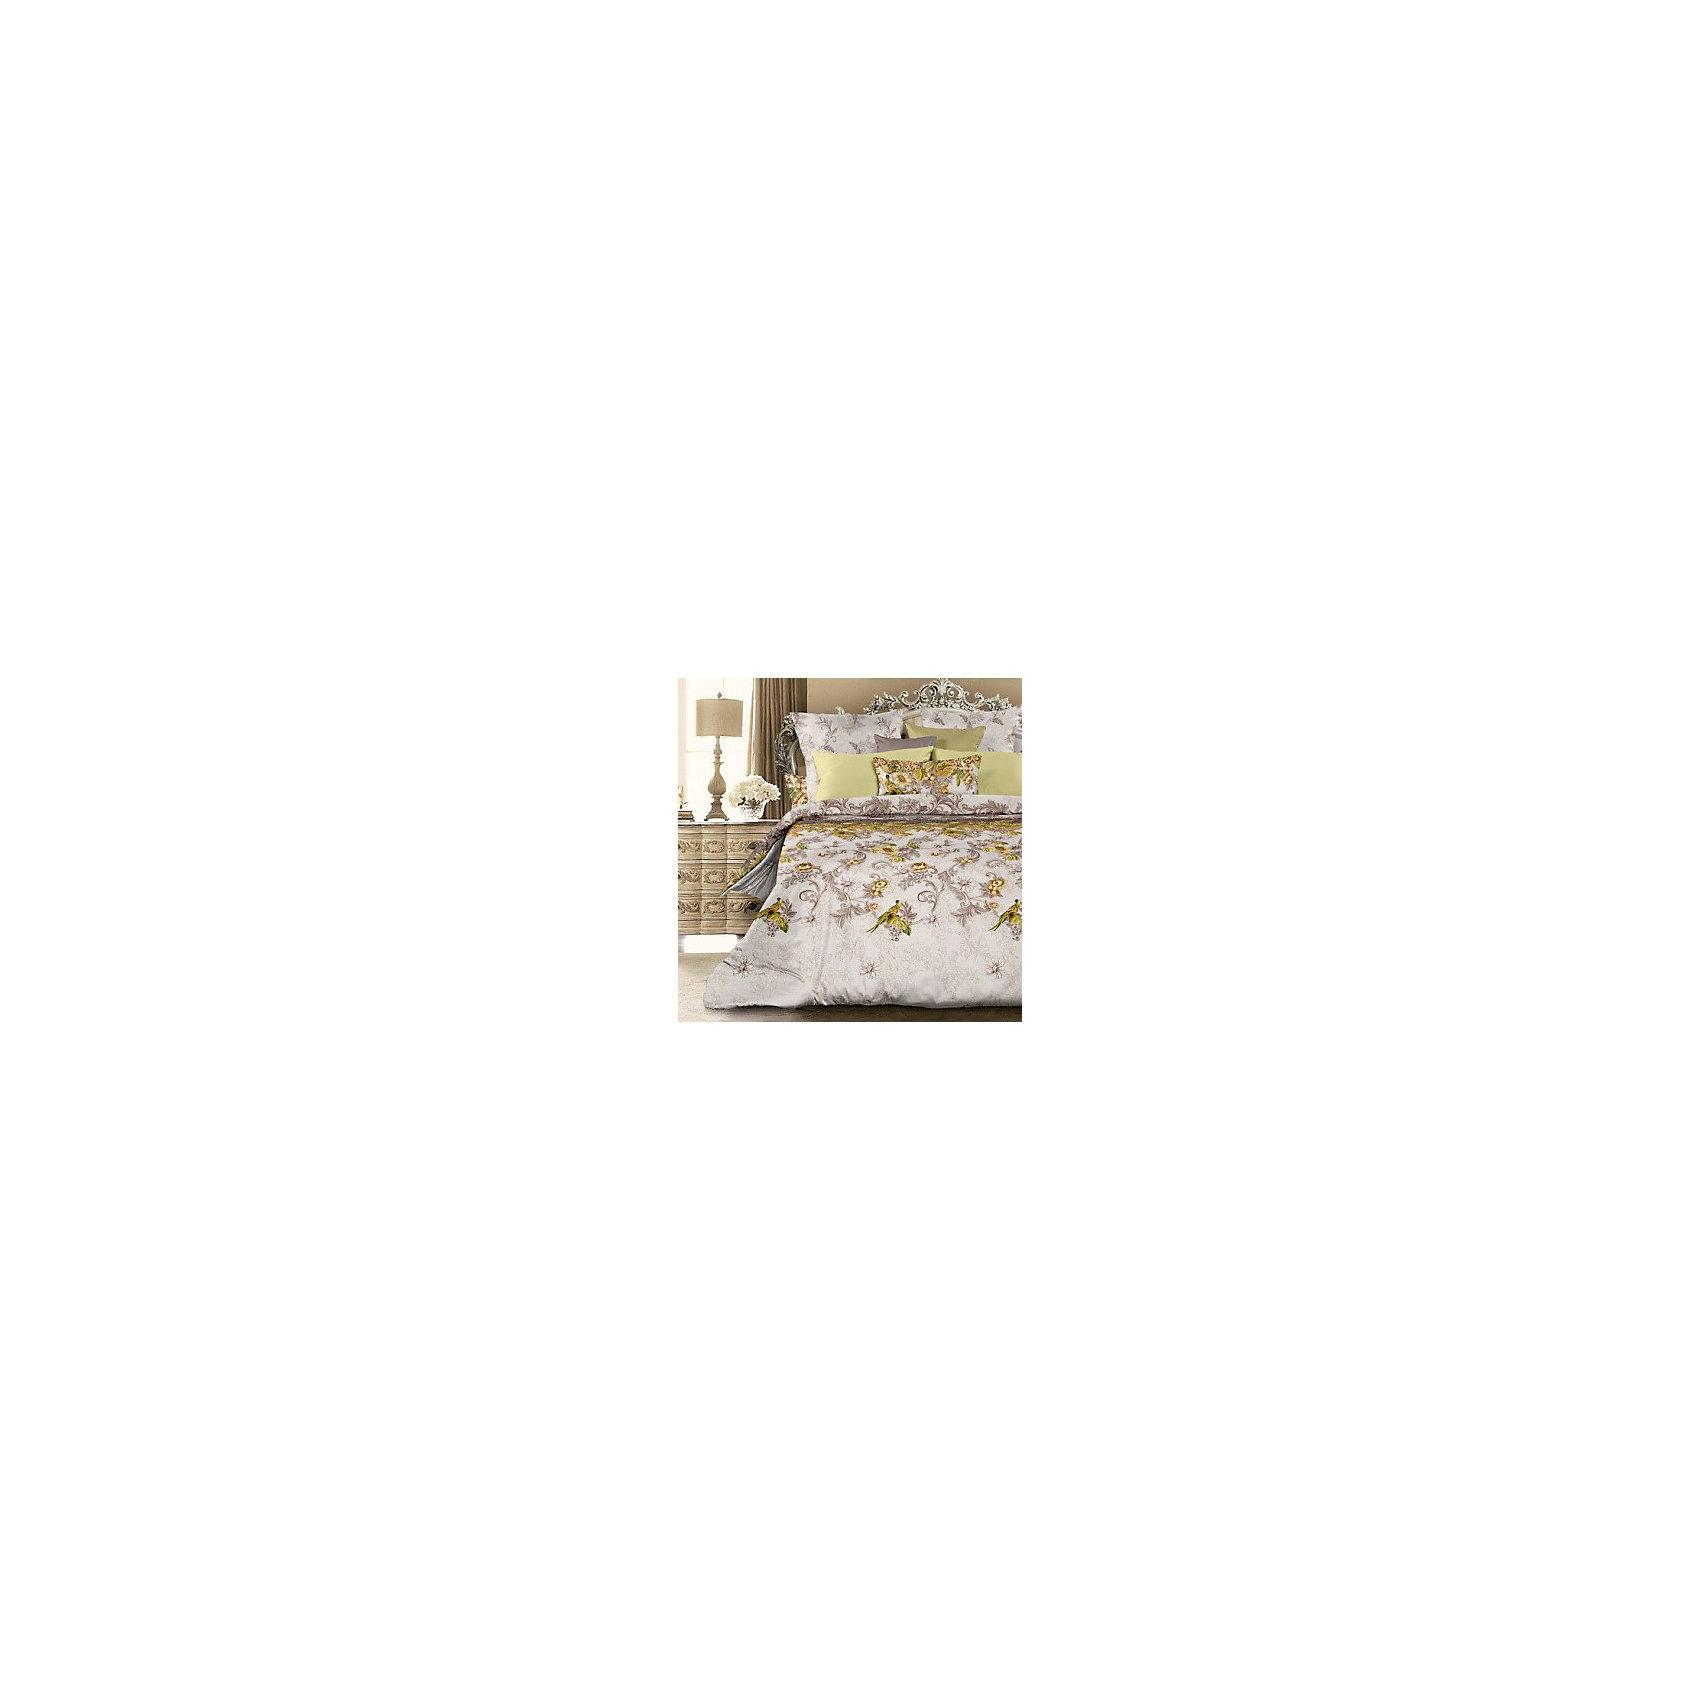 Унисон Постельное белье 2,0 Эрмитаж, Унисон биоматин